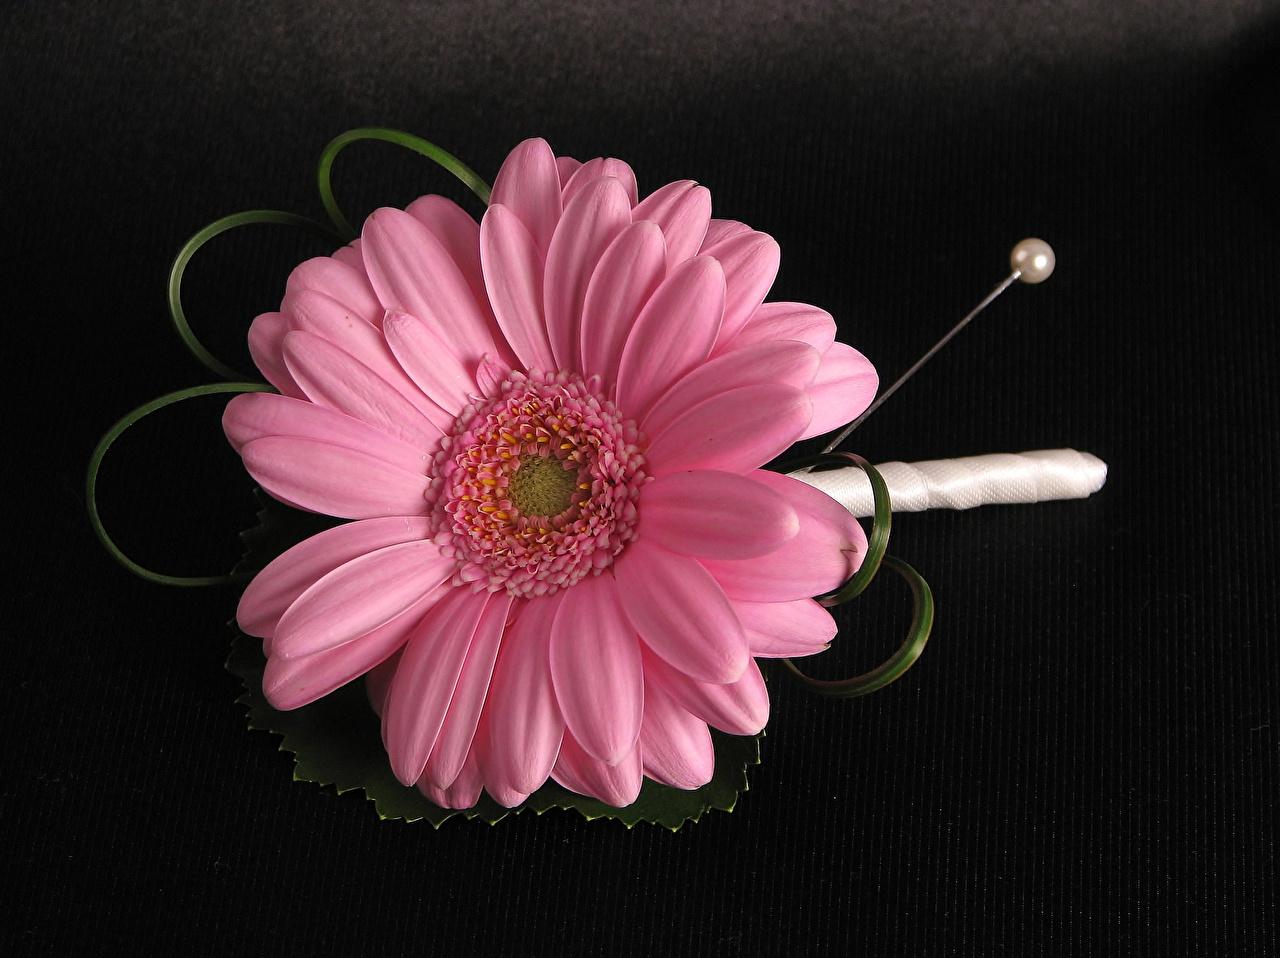 Picture Gerberas Pink color Flowers Closeup Black background